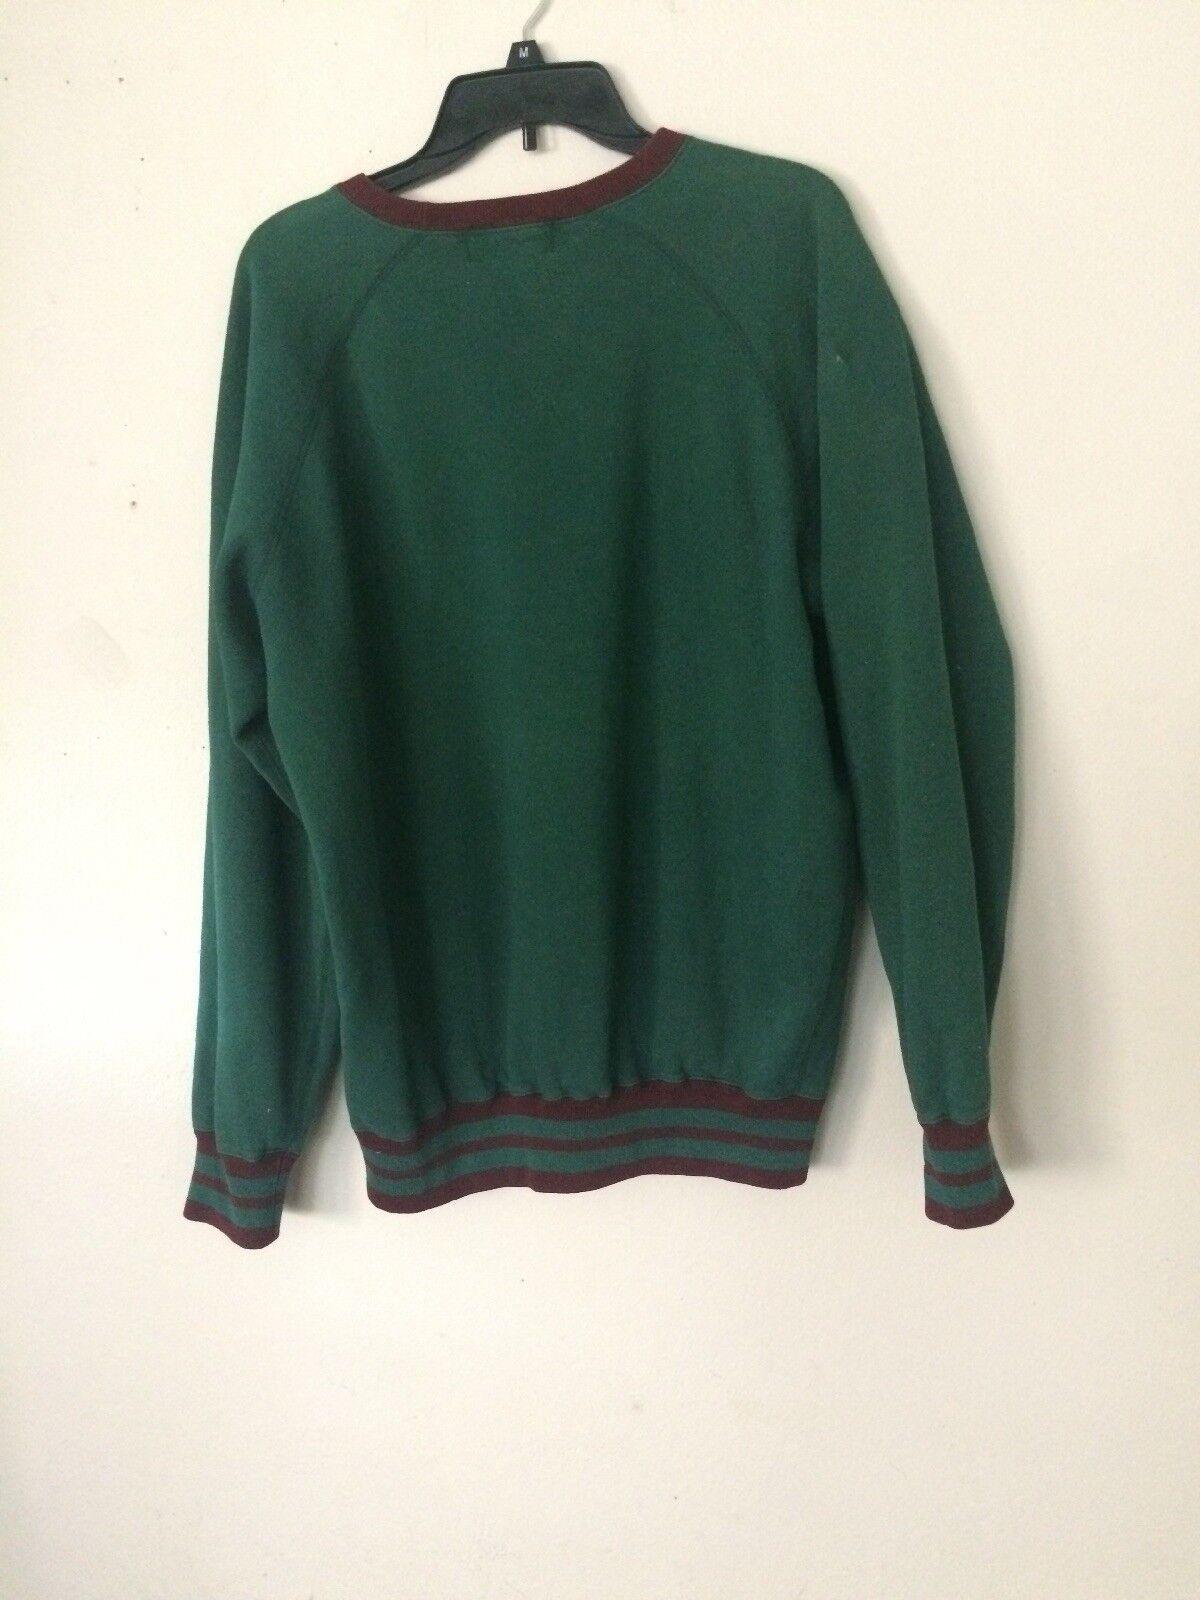 Vtg 80s 90s Polo Ralph Lauren RLPC Green Sweatshi… - image 4